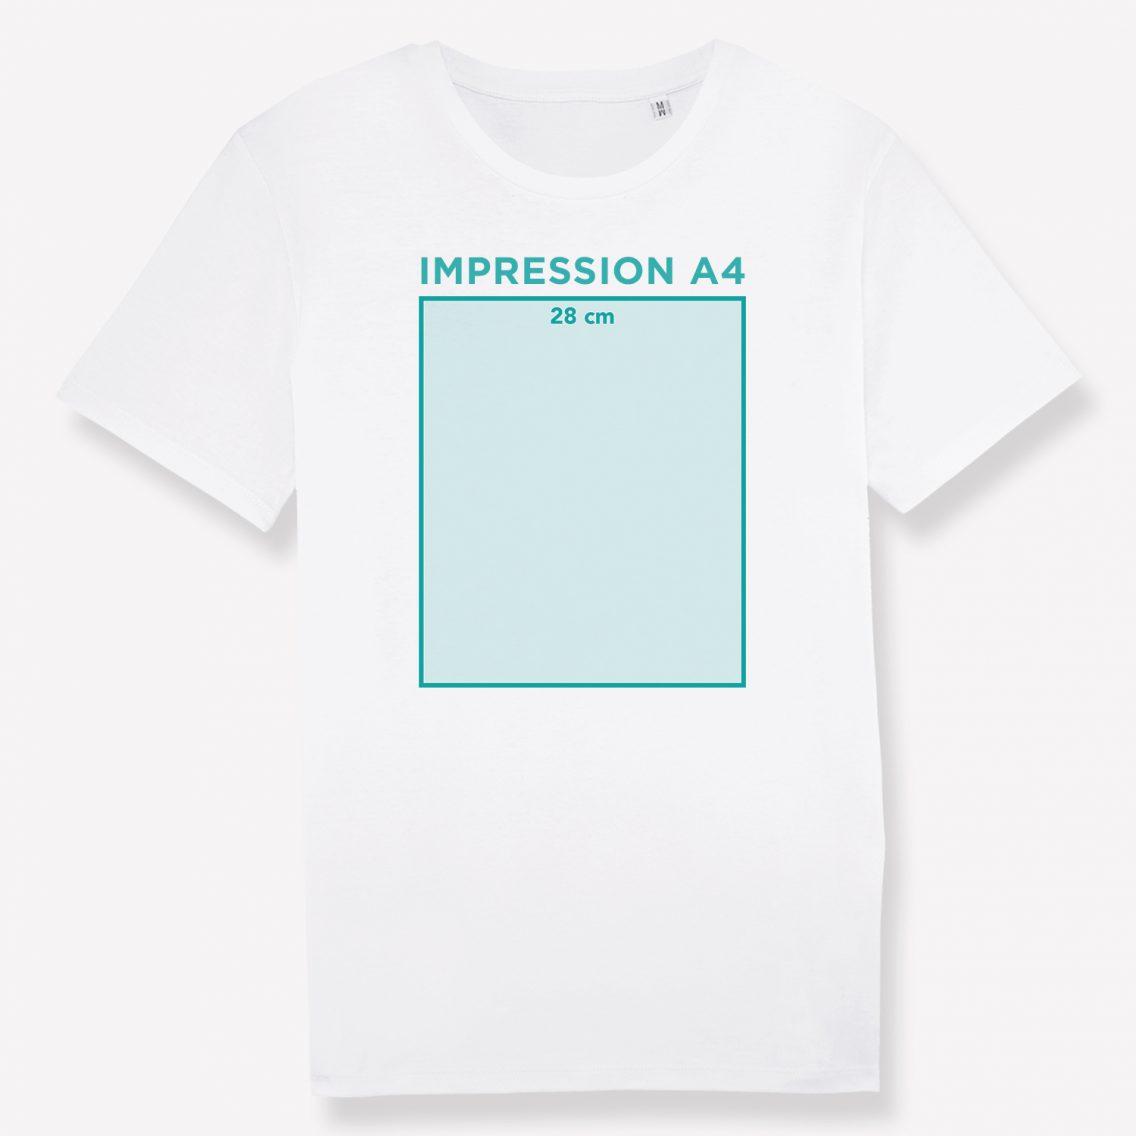 Impression A4